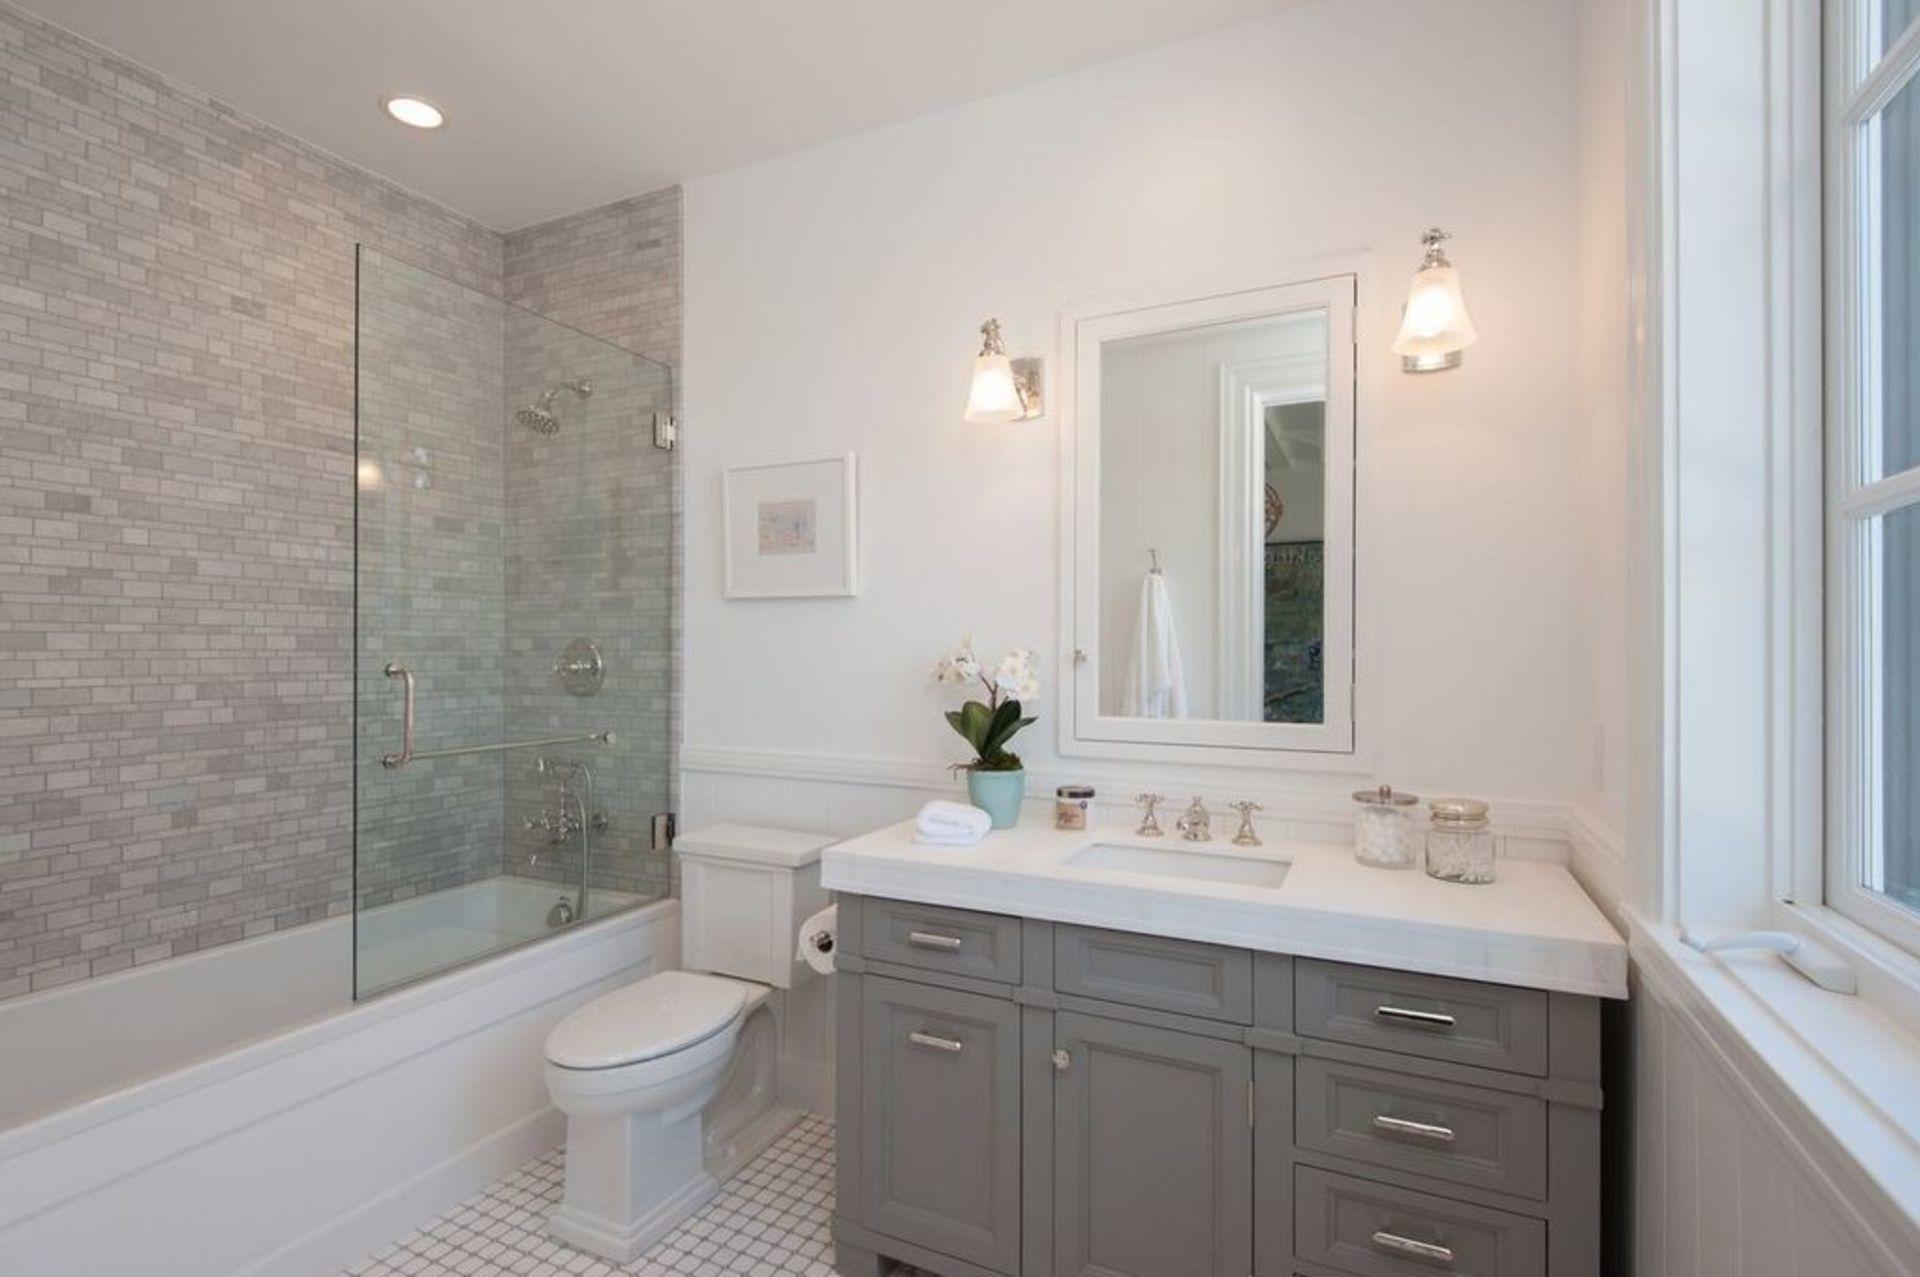 10 Ways to Make a Small Bathroom Look Bigger